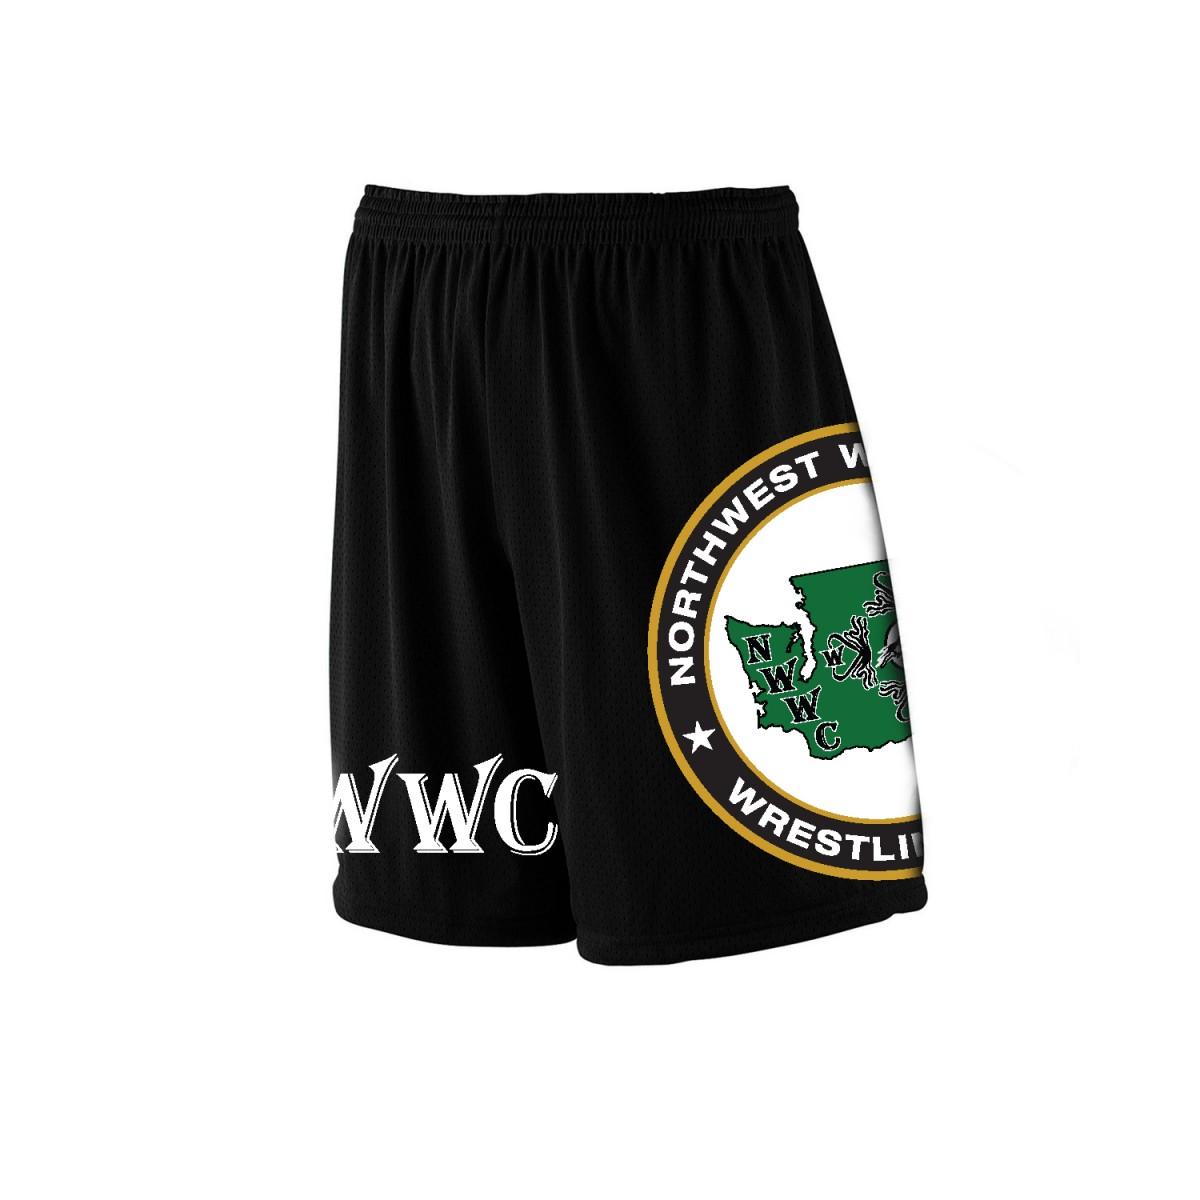 NWWC Black Shorts Green Logo-Black-2XL